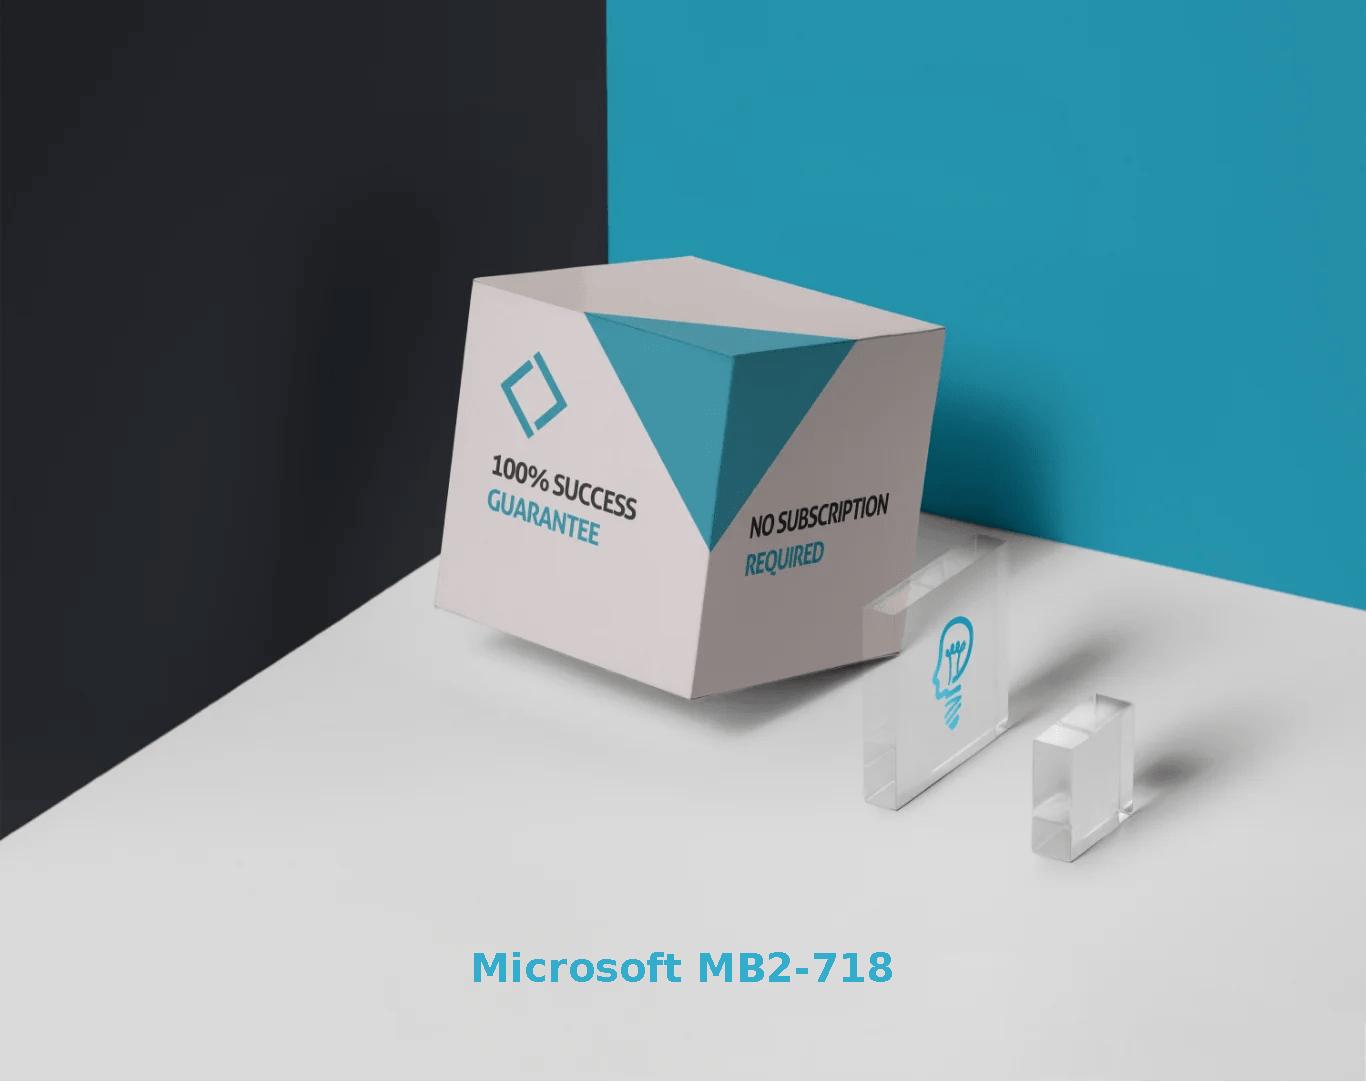 Microsoft MB2-718 Exams